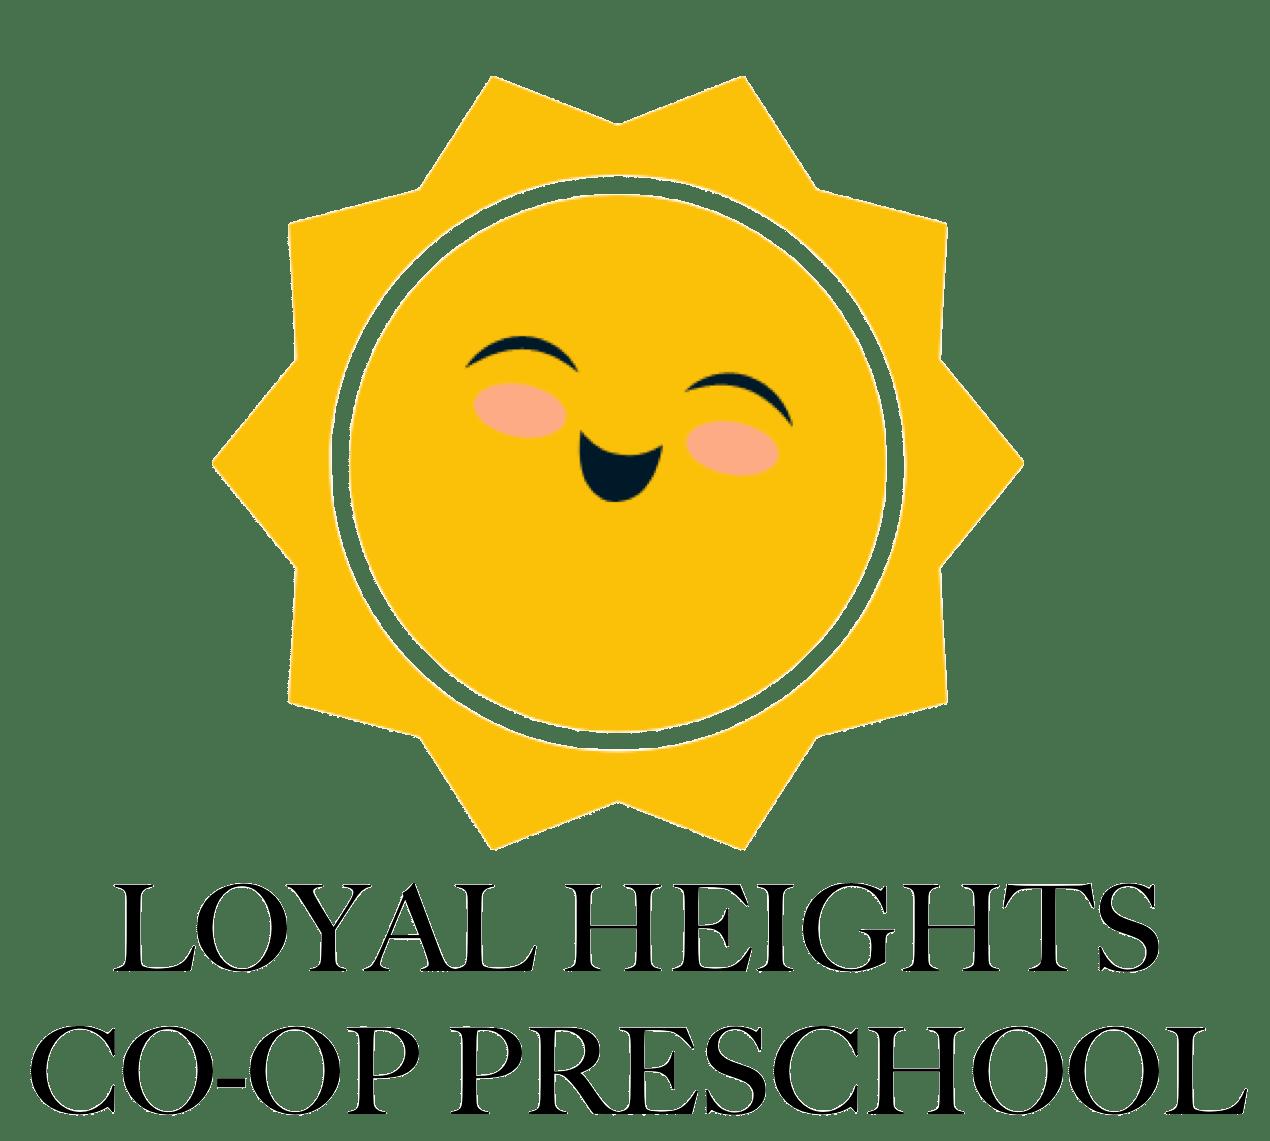 Loya Heights Co-op Preschool